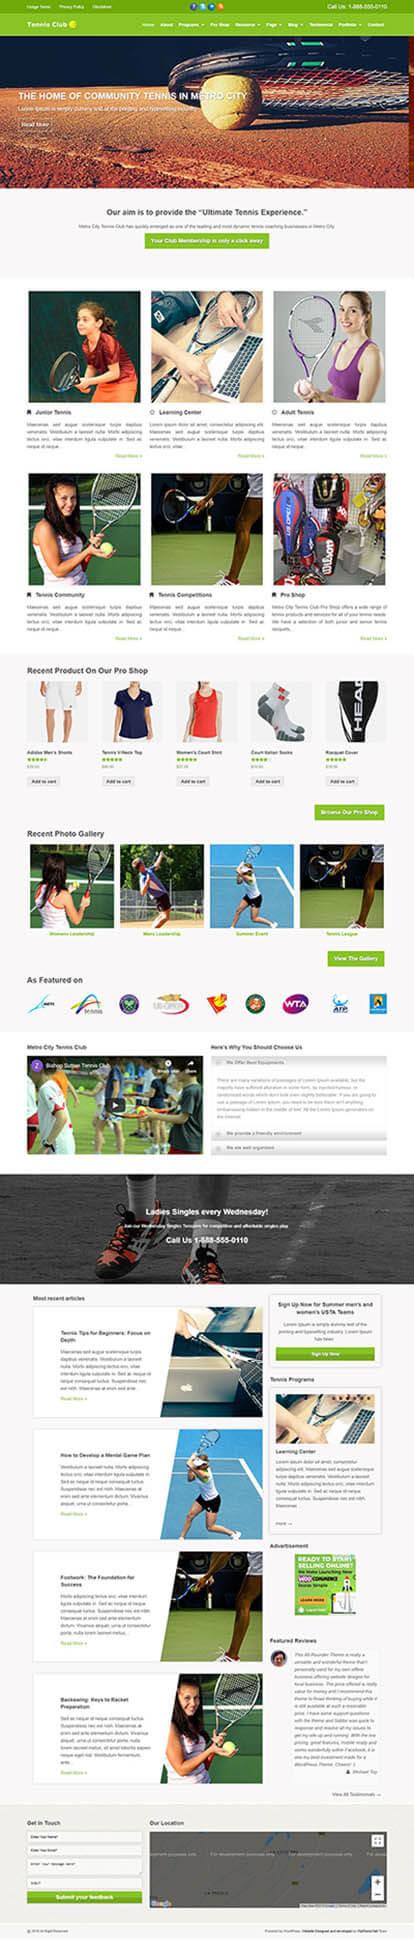 Tennis Club WORDPRESS THEME Full Demo